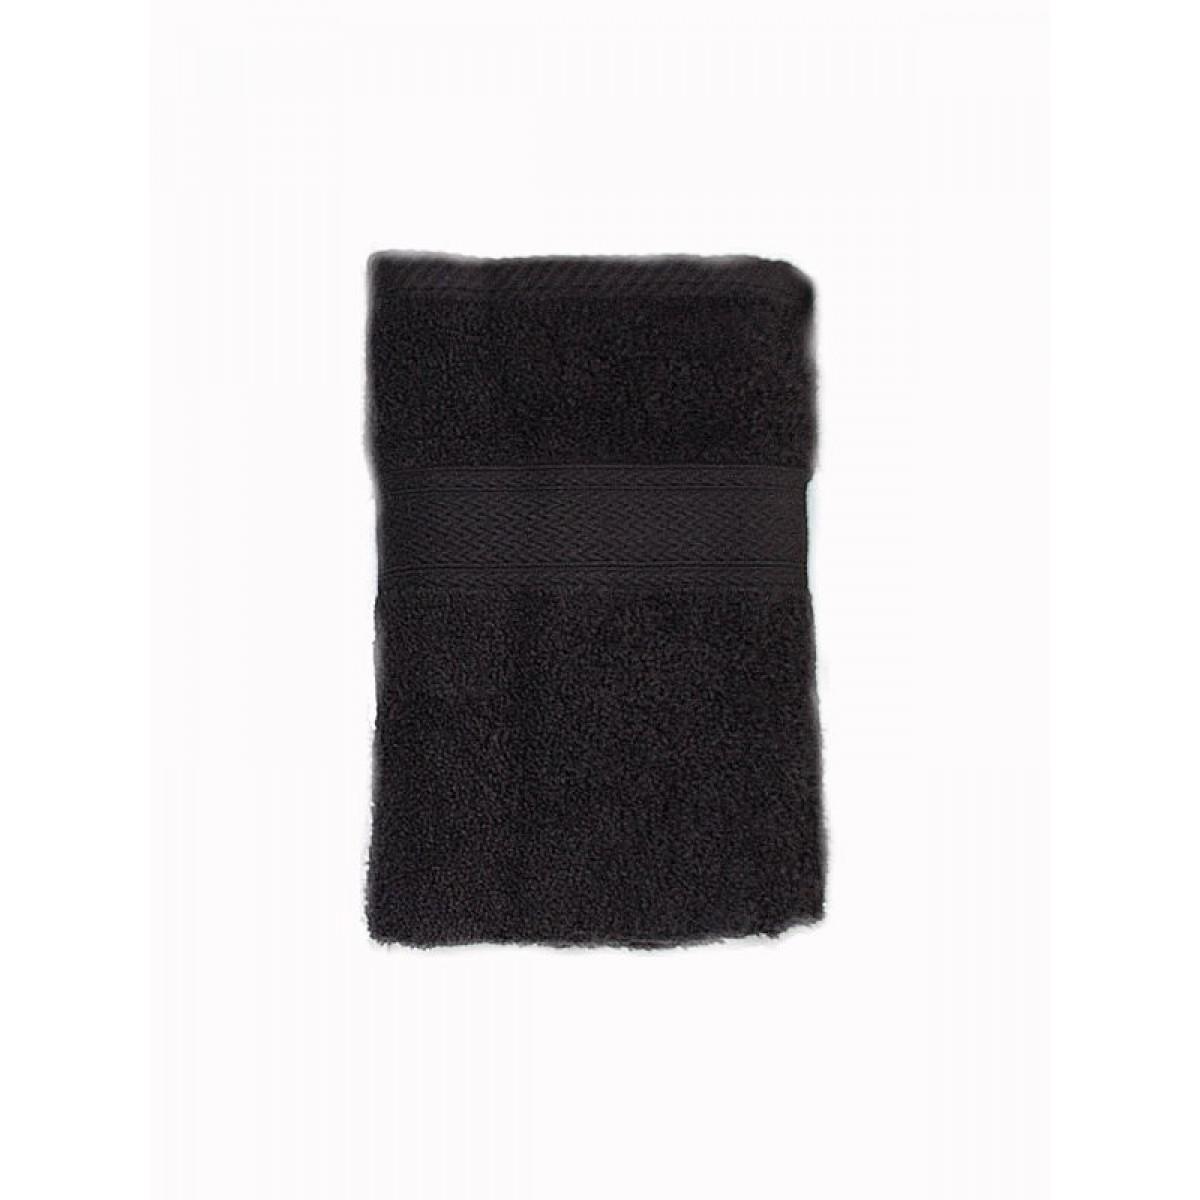 CONZEPT Håndklæde 90 x 180 cm. sort